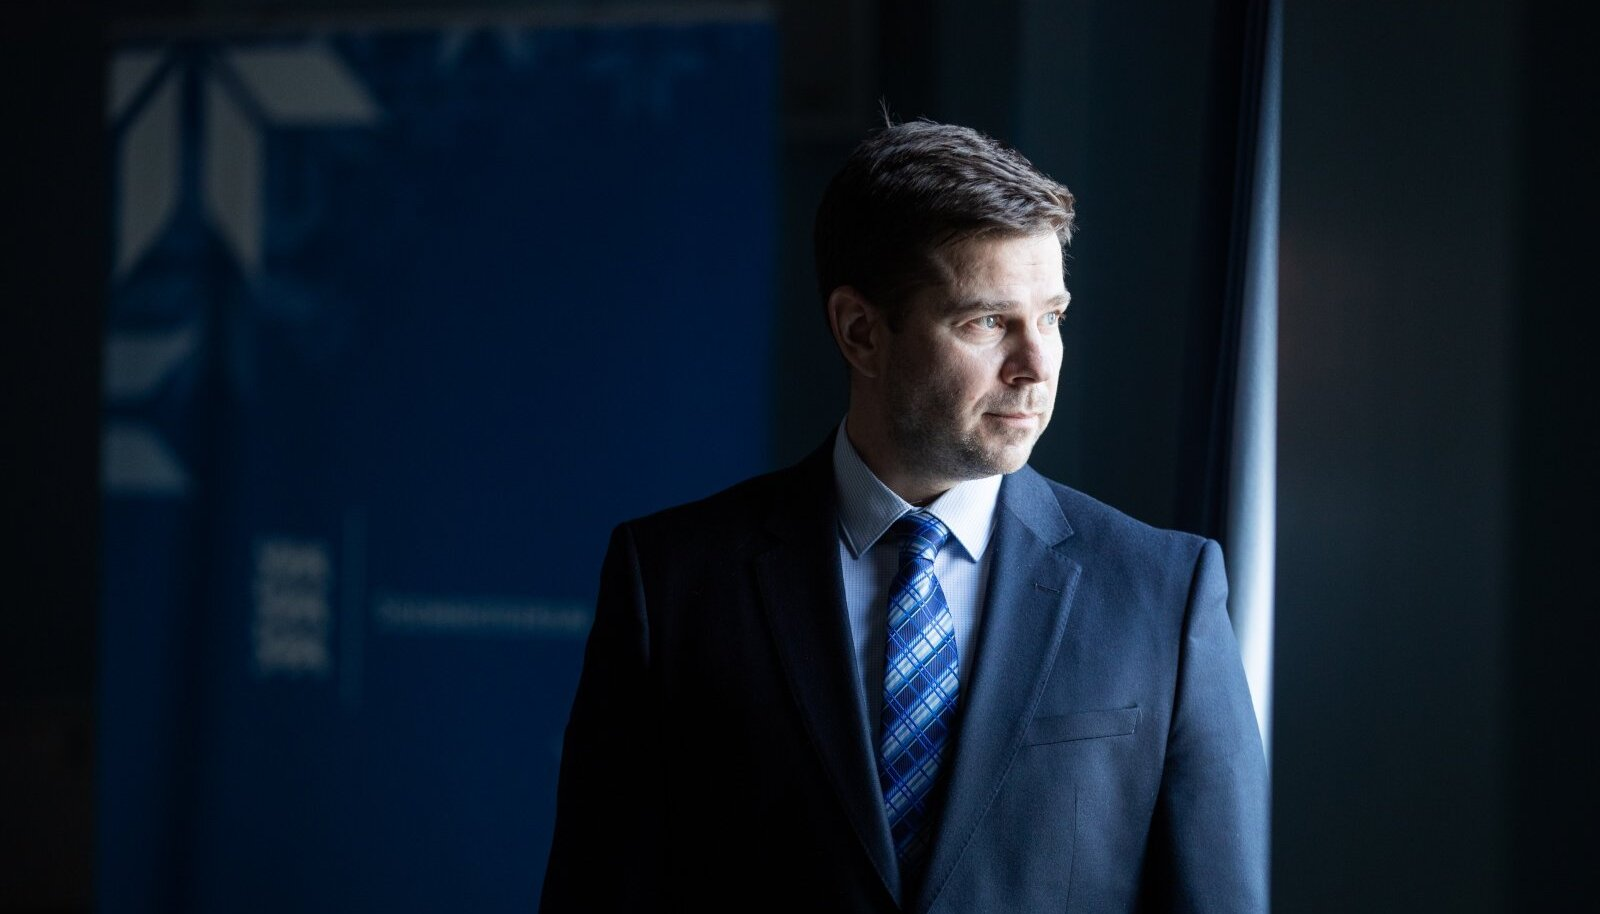 Siseminister Kristian Jaani